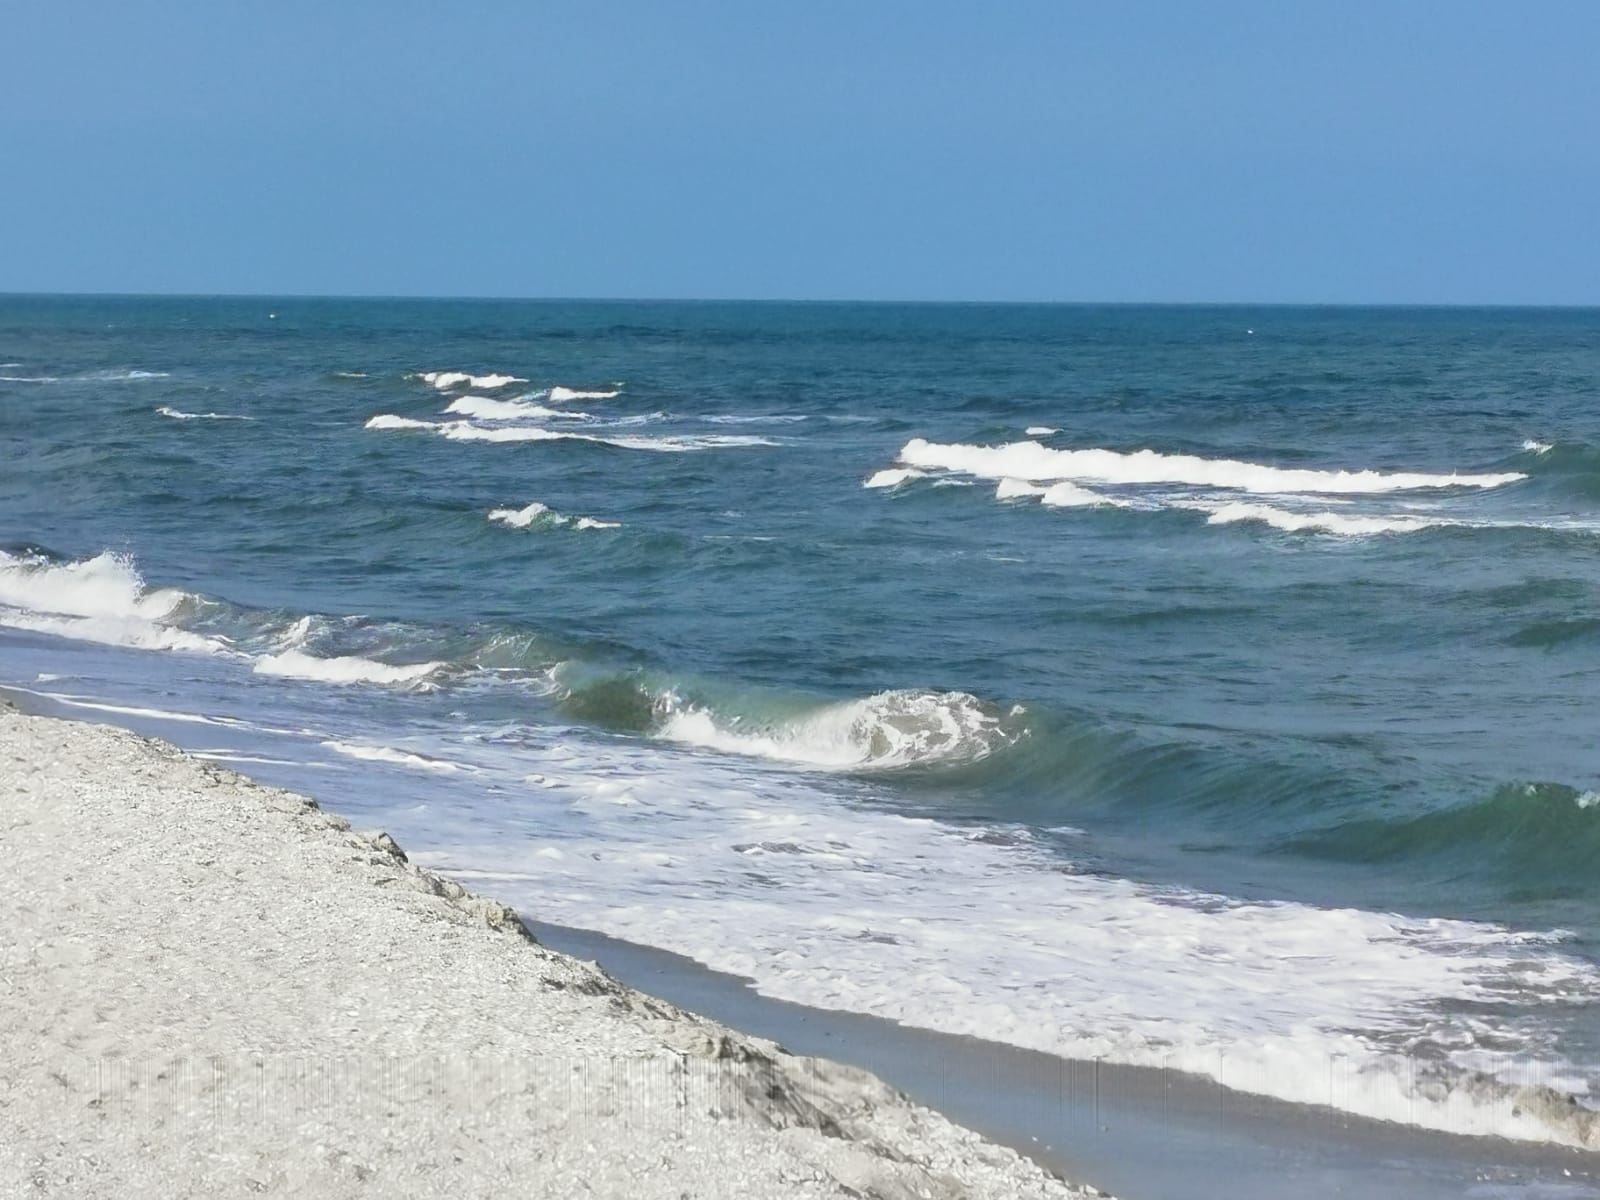 Alege azi aceste 10 cazari cu vedere la mare